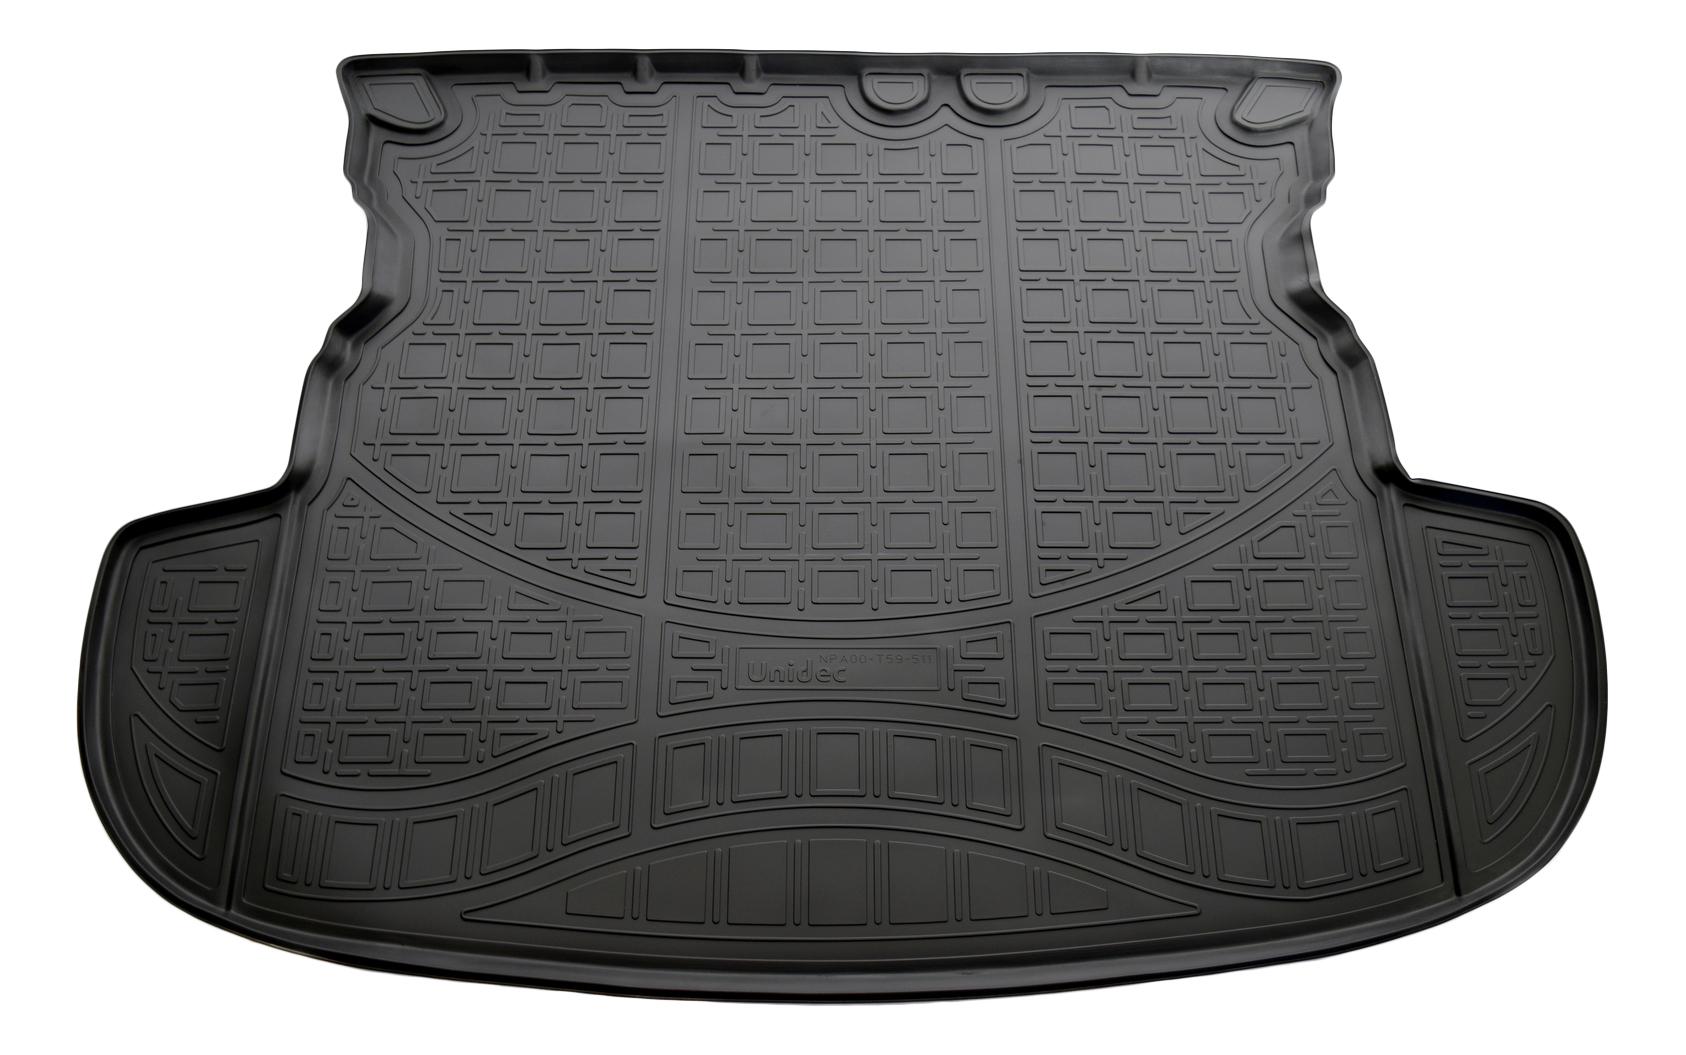 Коврик в багажник автомобиля для Mitsubishi Norplast (NPA00-T59-511)